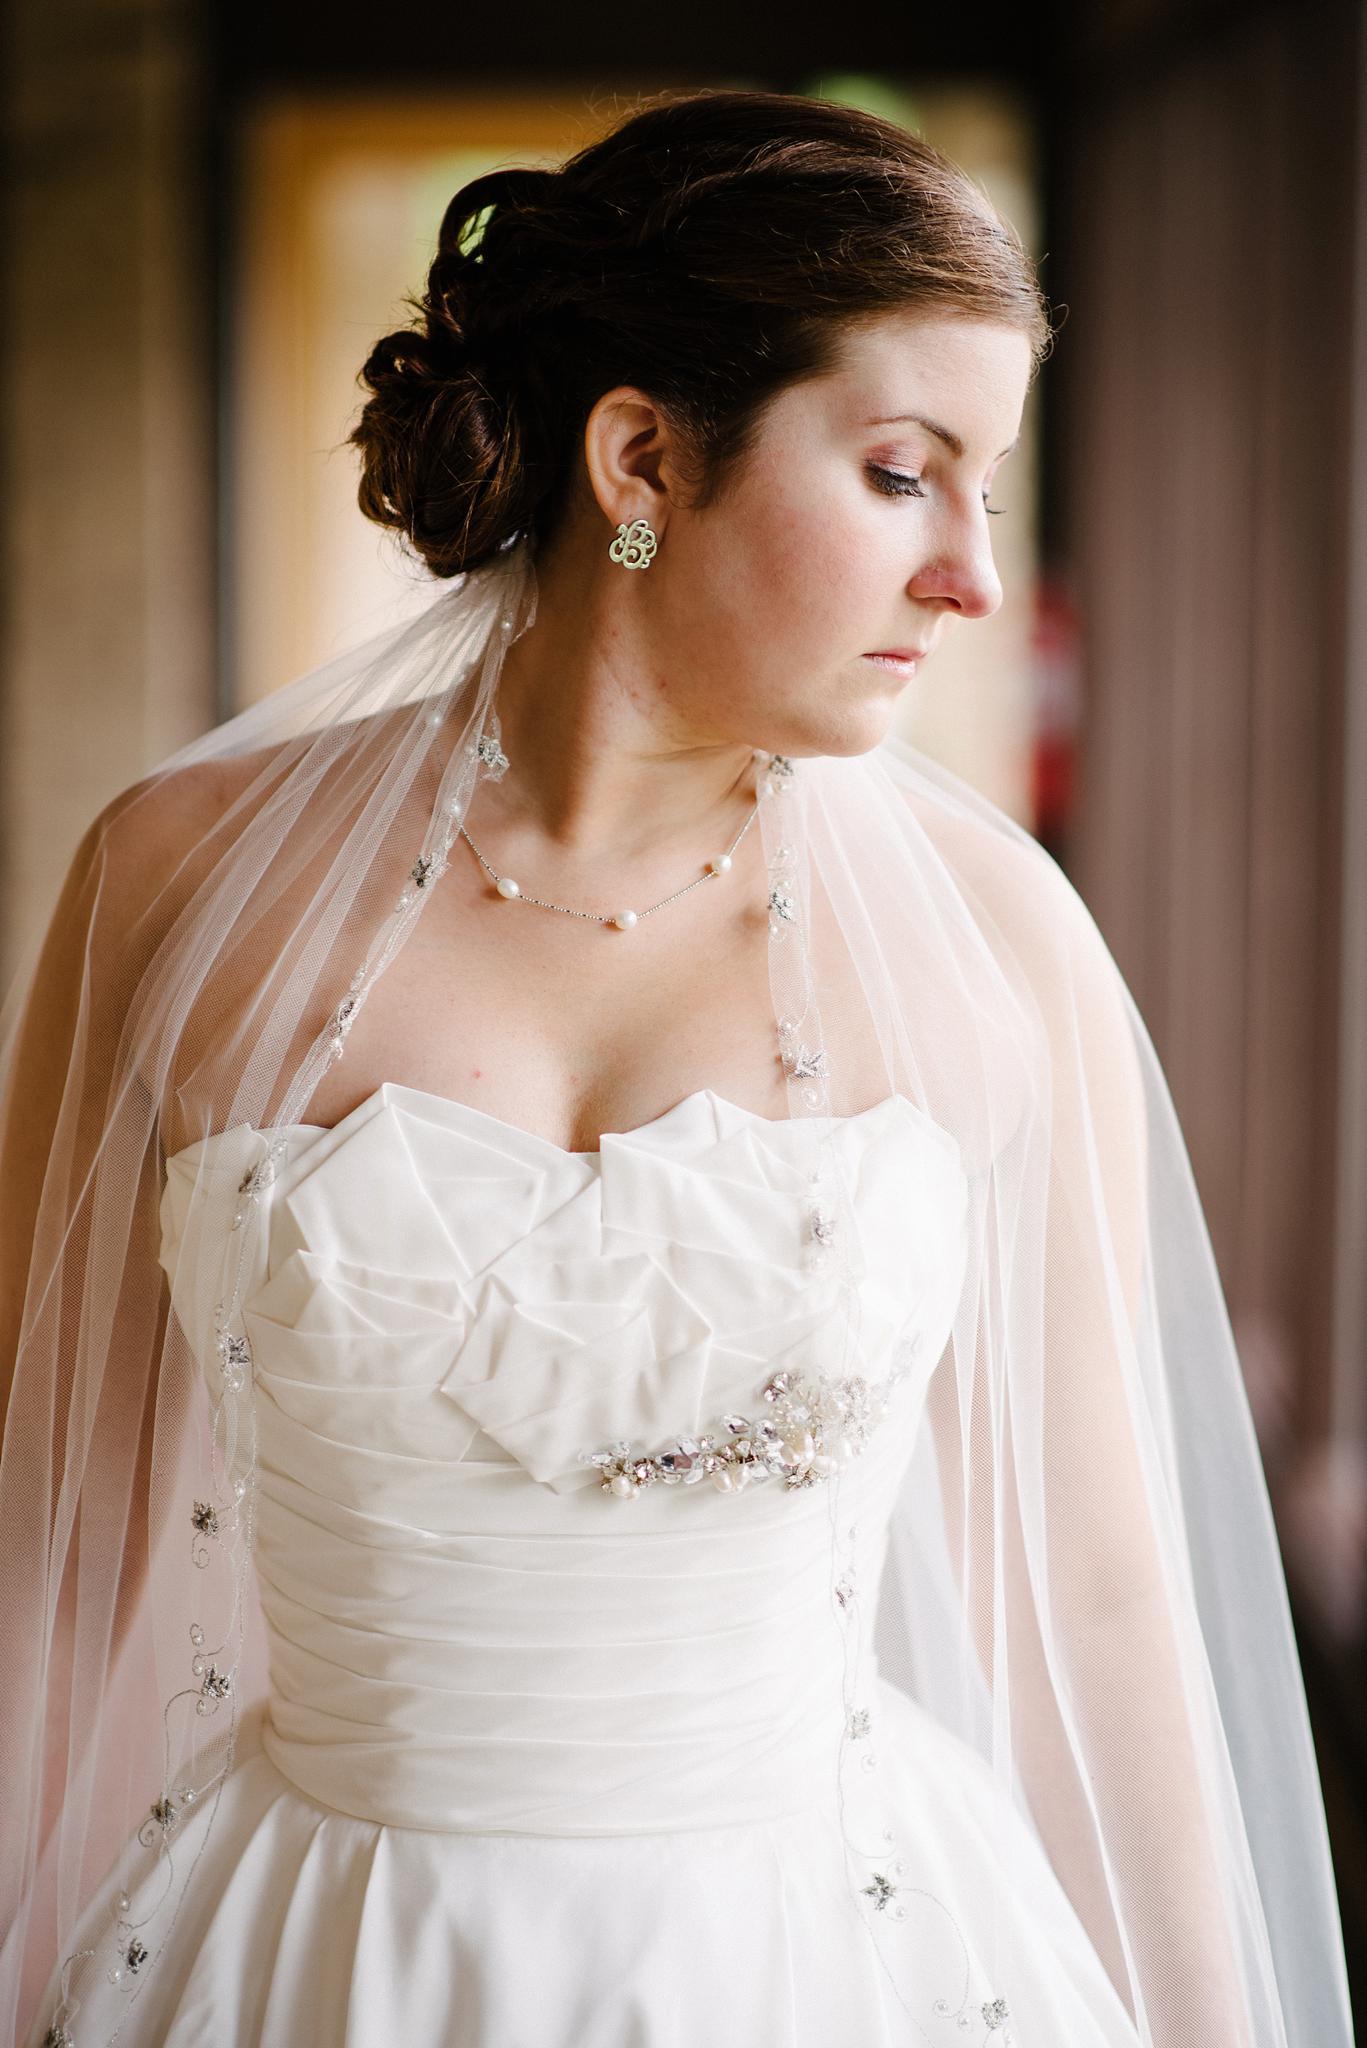 Fredericksburg Country Club Wedding Virginia Rachel Rossetti Photography_0150.jpg